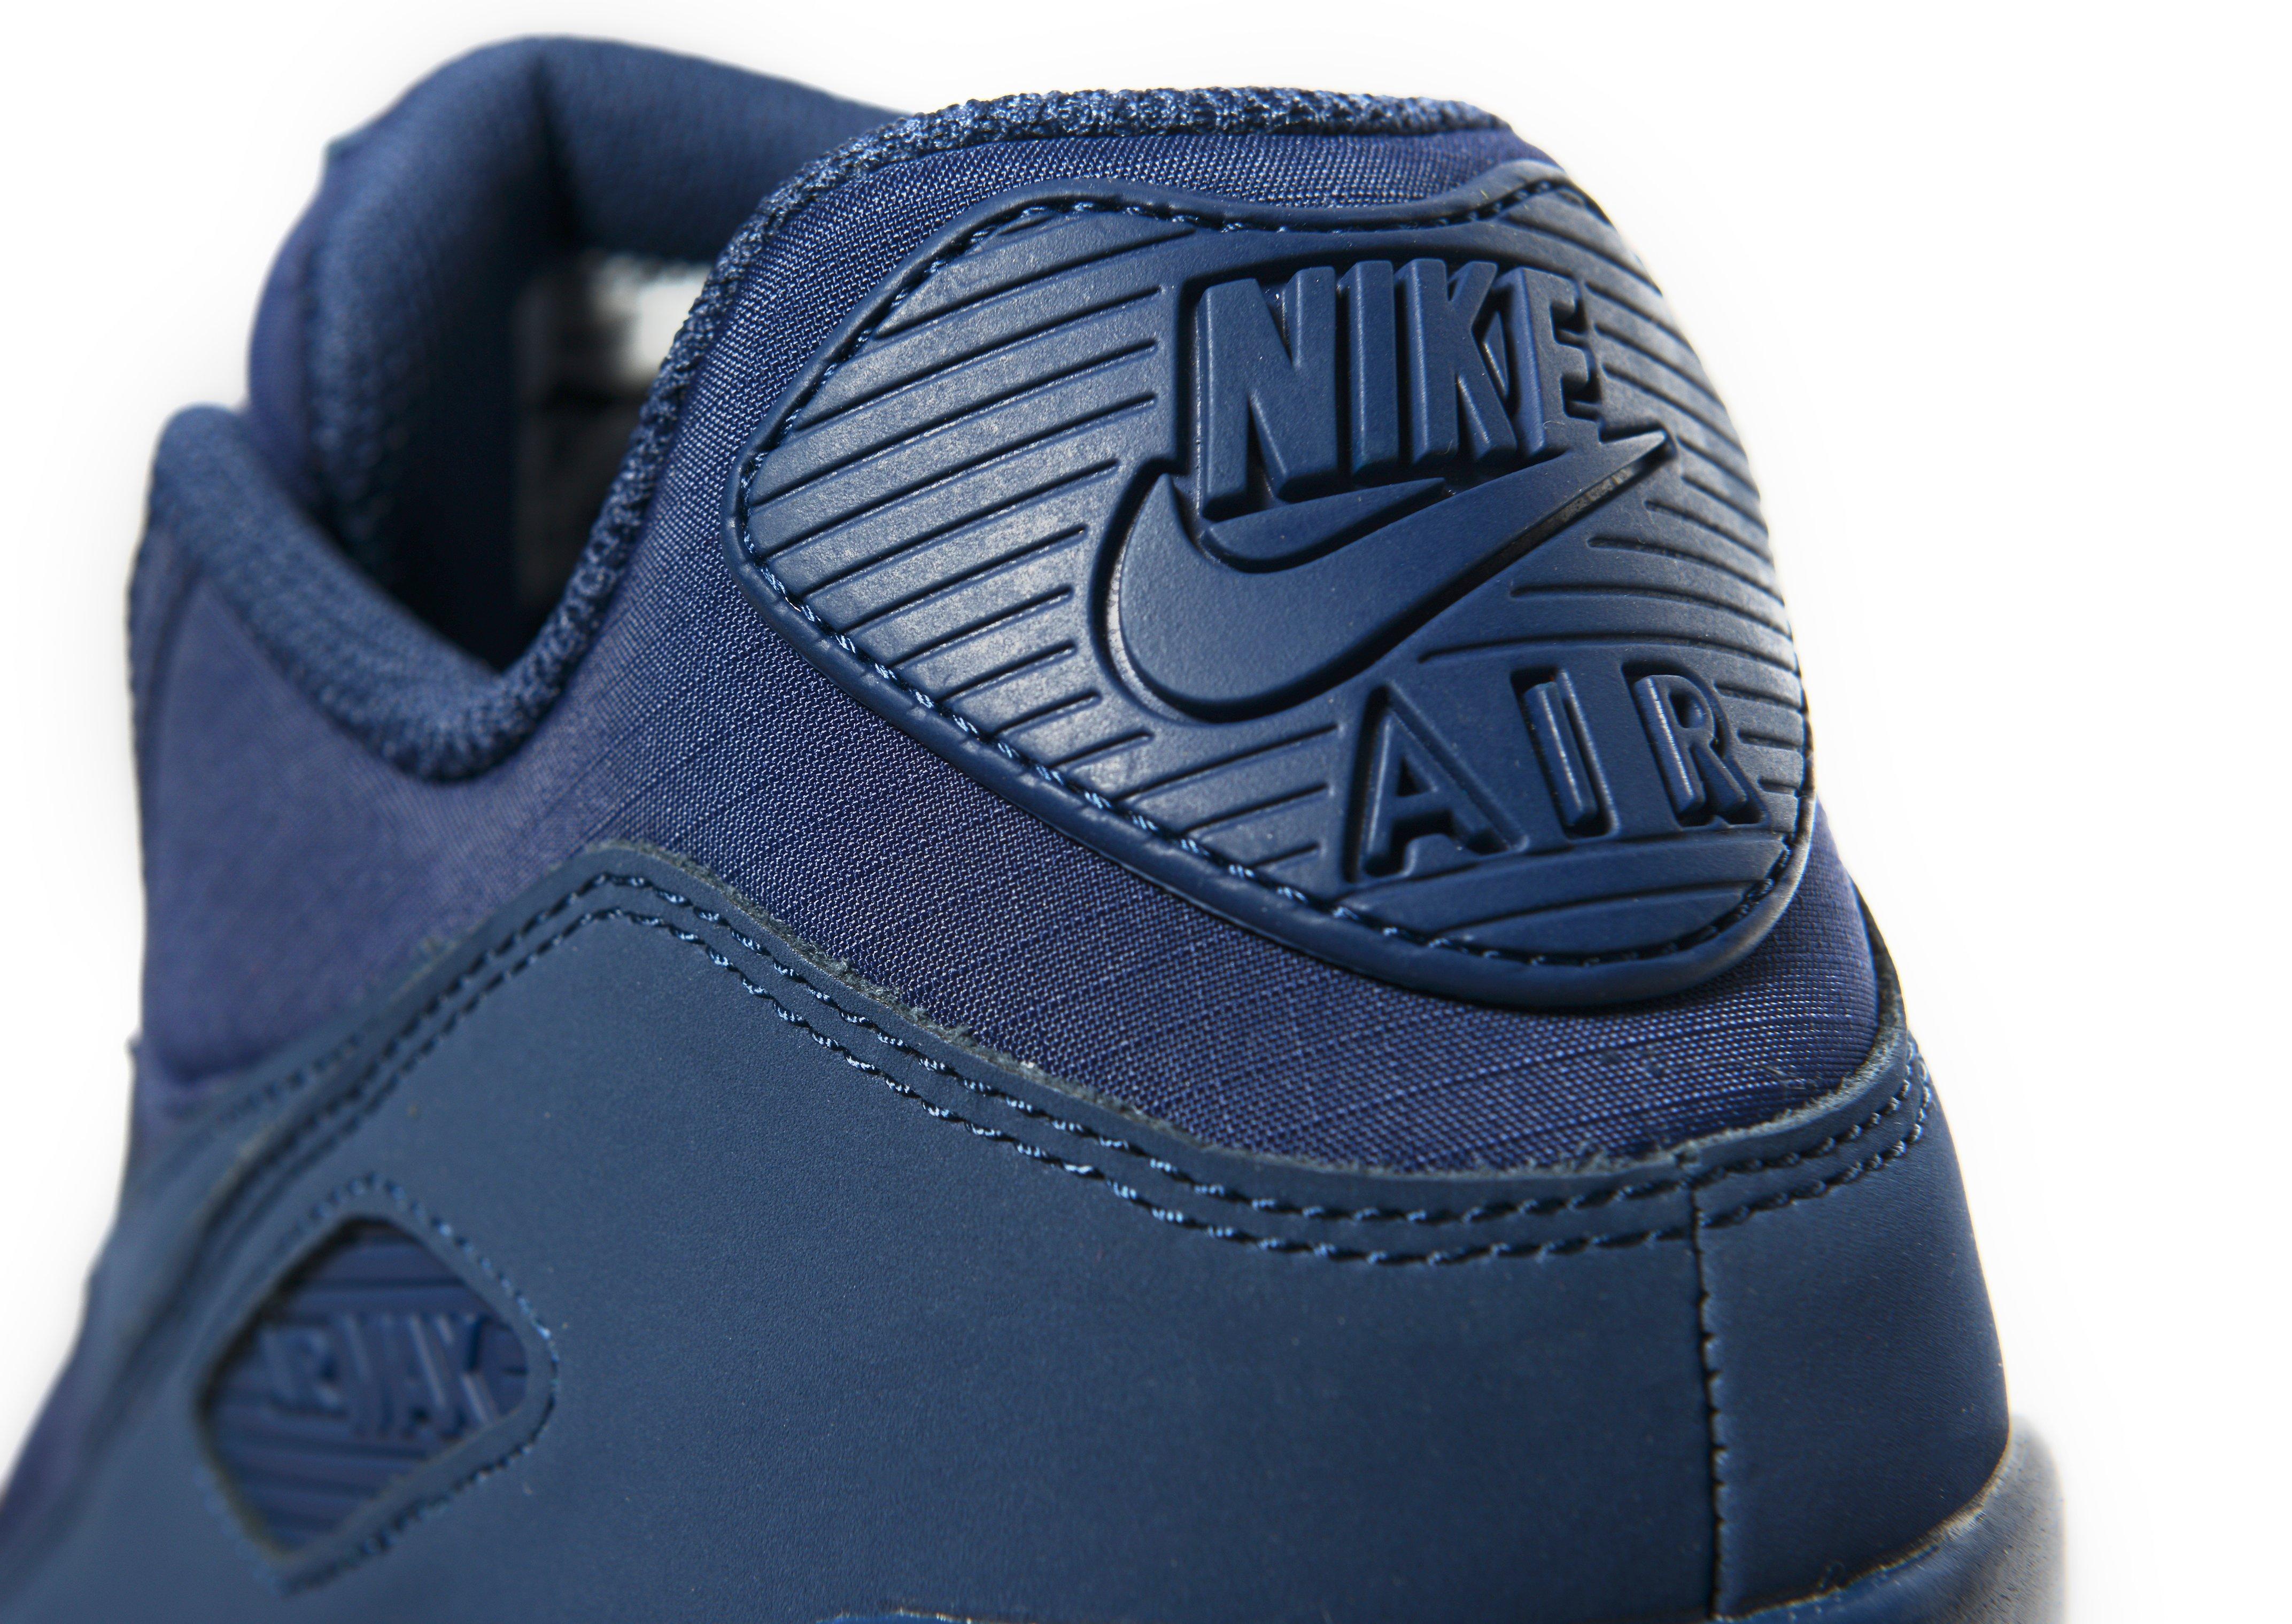 nike air max 90 navy blue jd